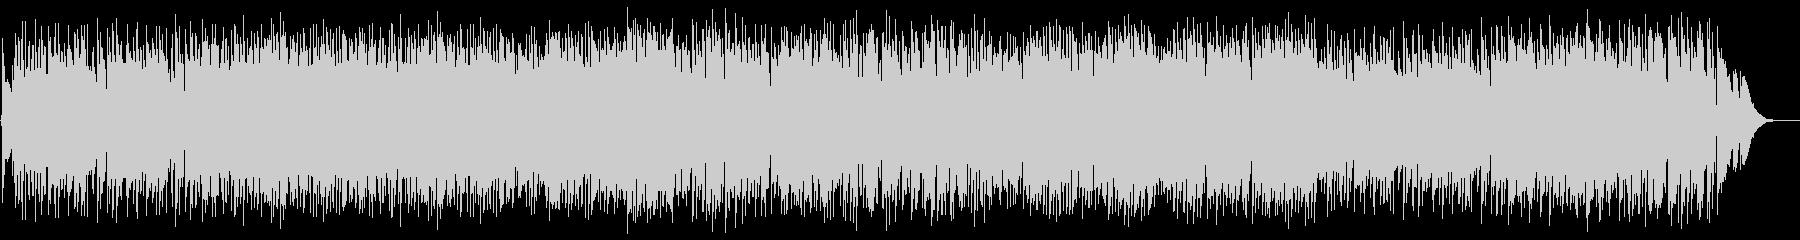 Doggy's Waltz (F. Chopin) Jazz's unreproduced waveform